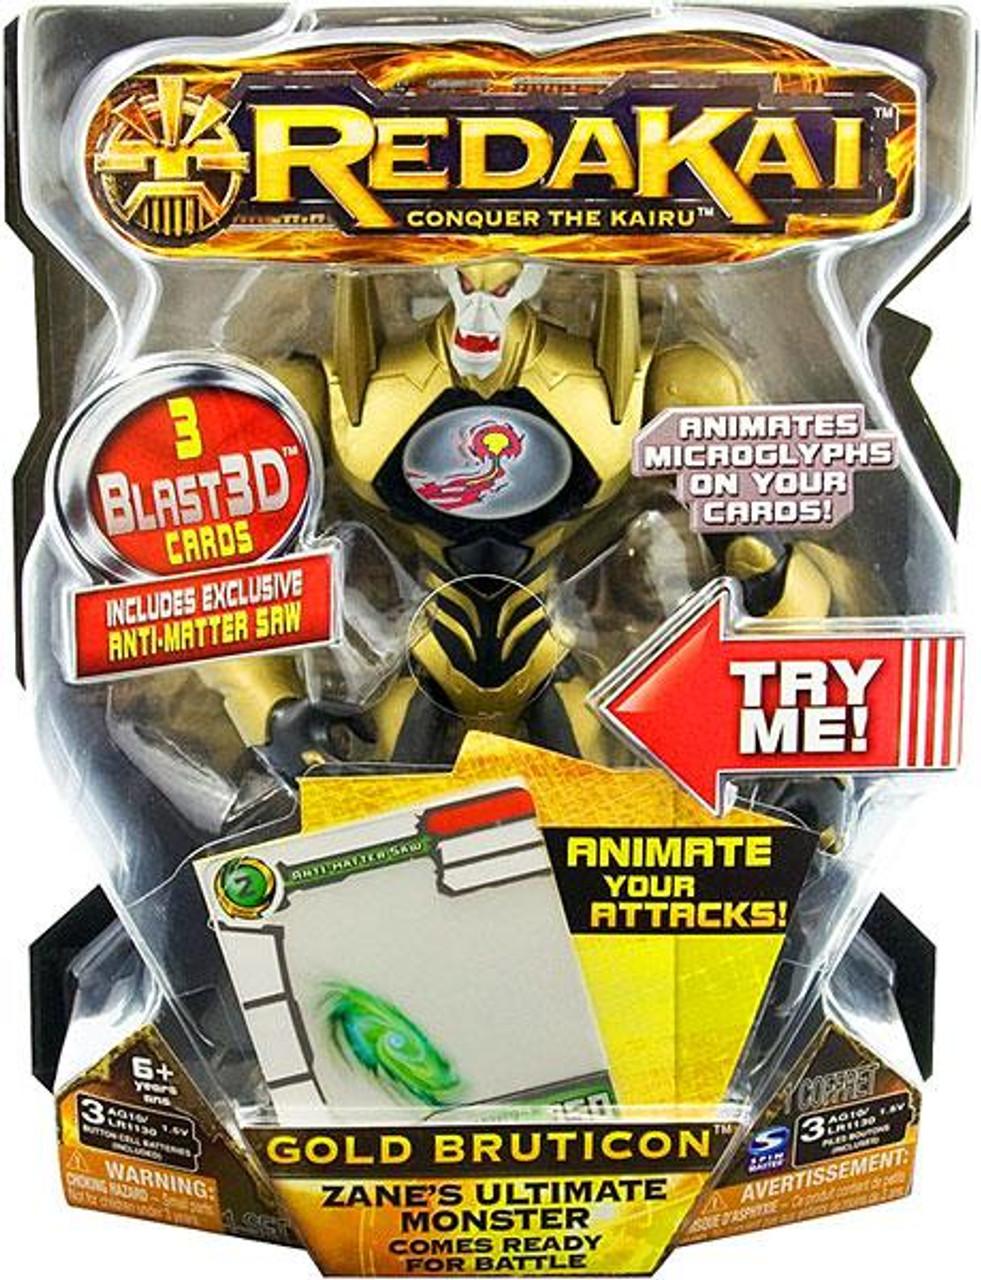 Redakai Deluxe Gold Bruticon Action Figure